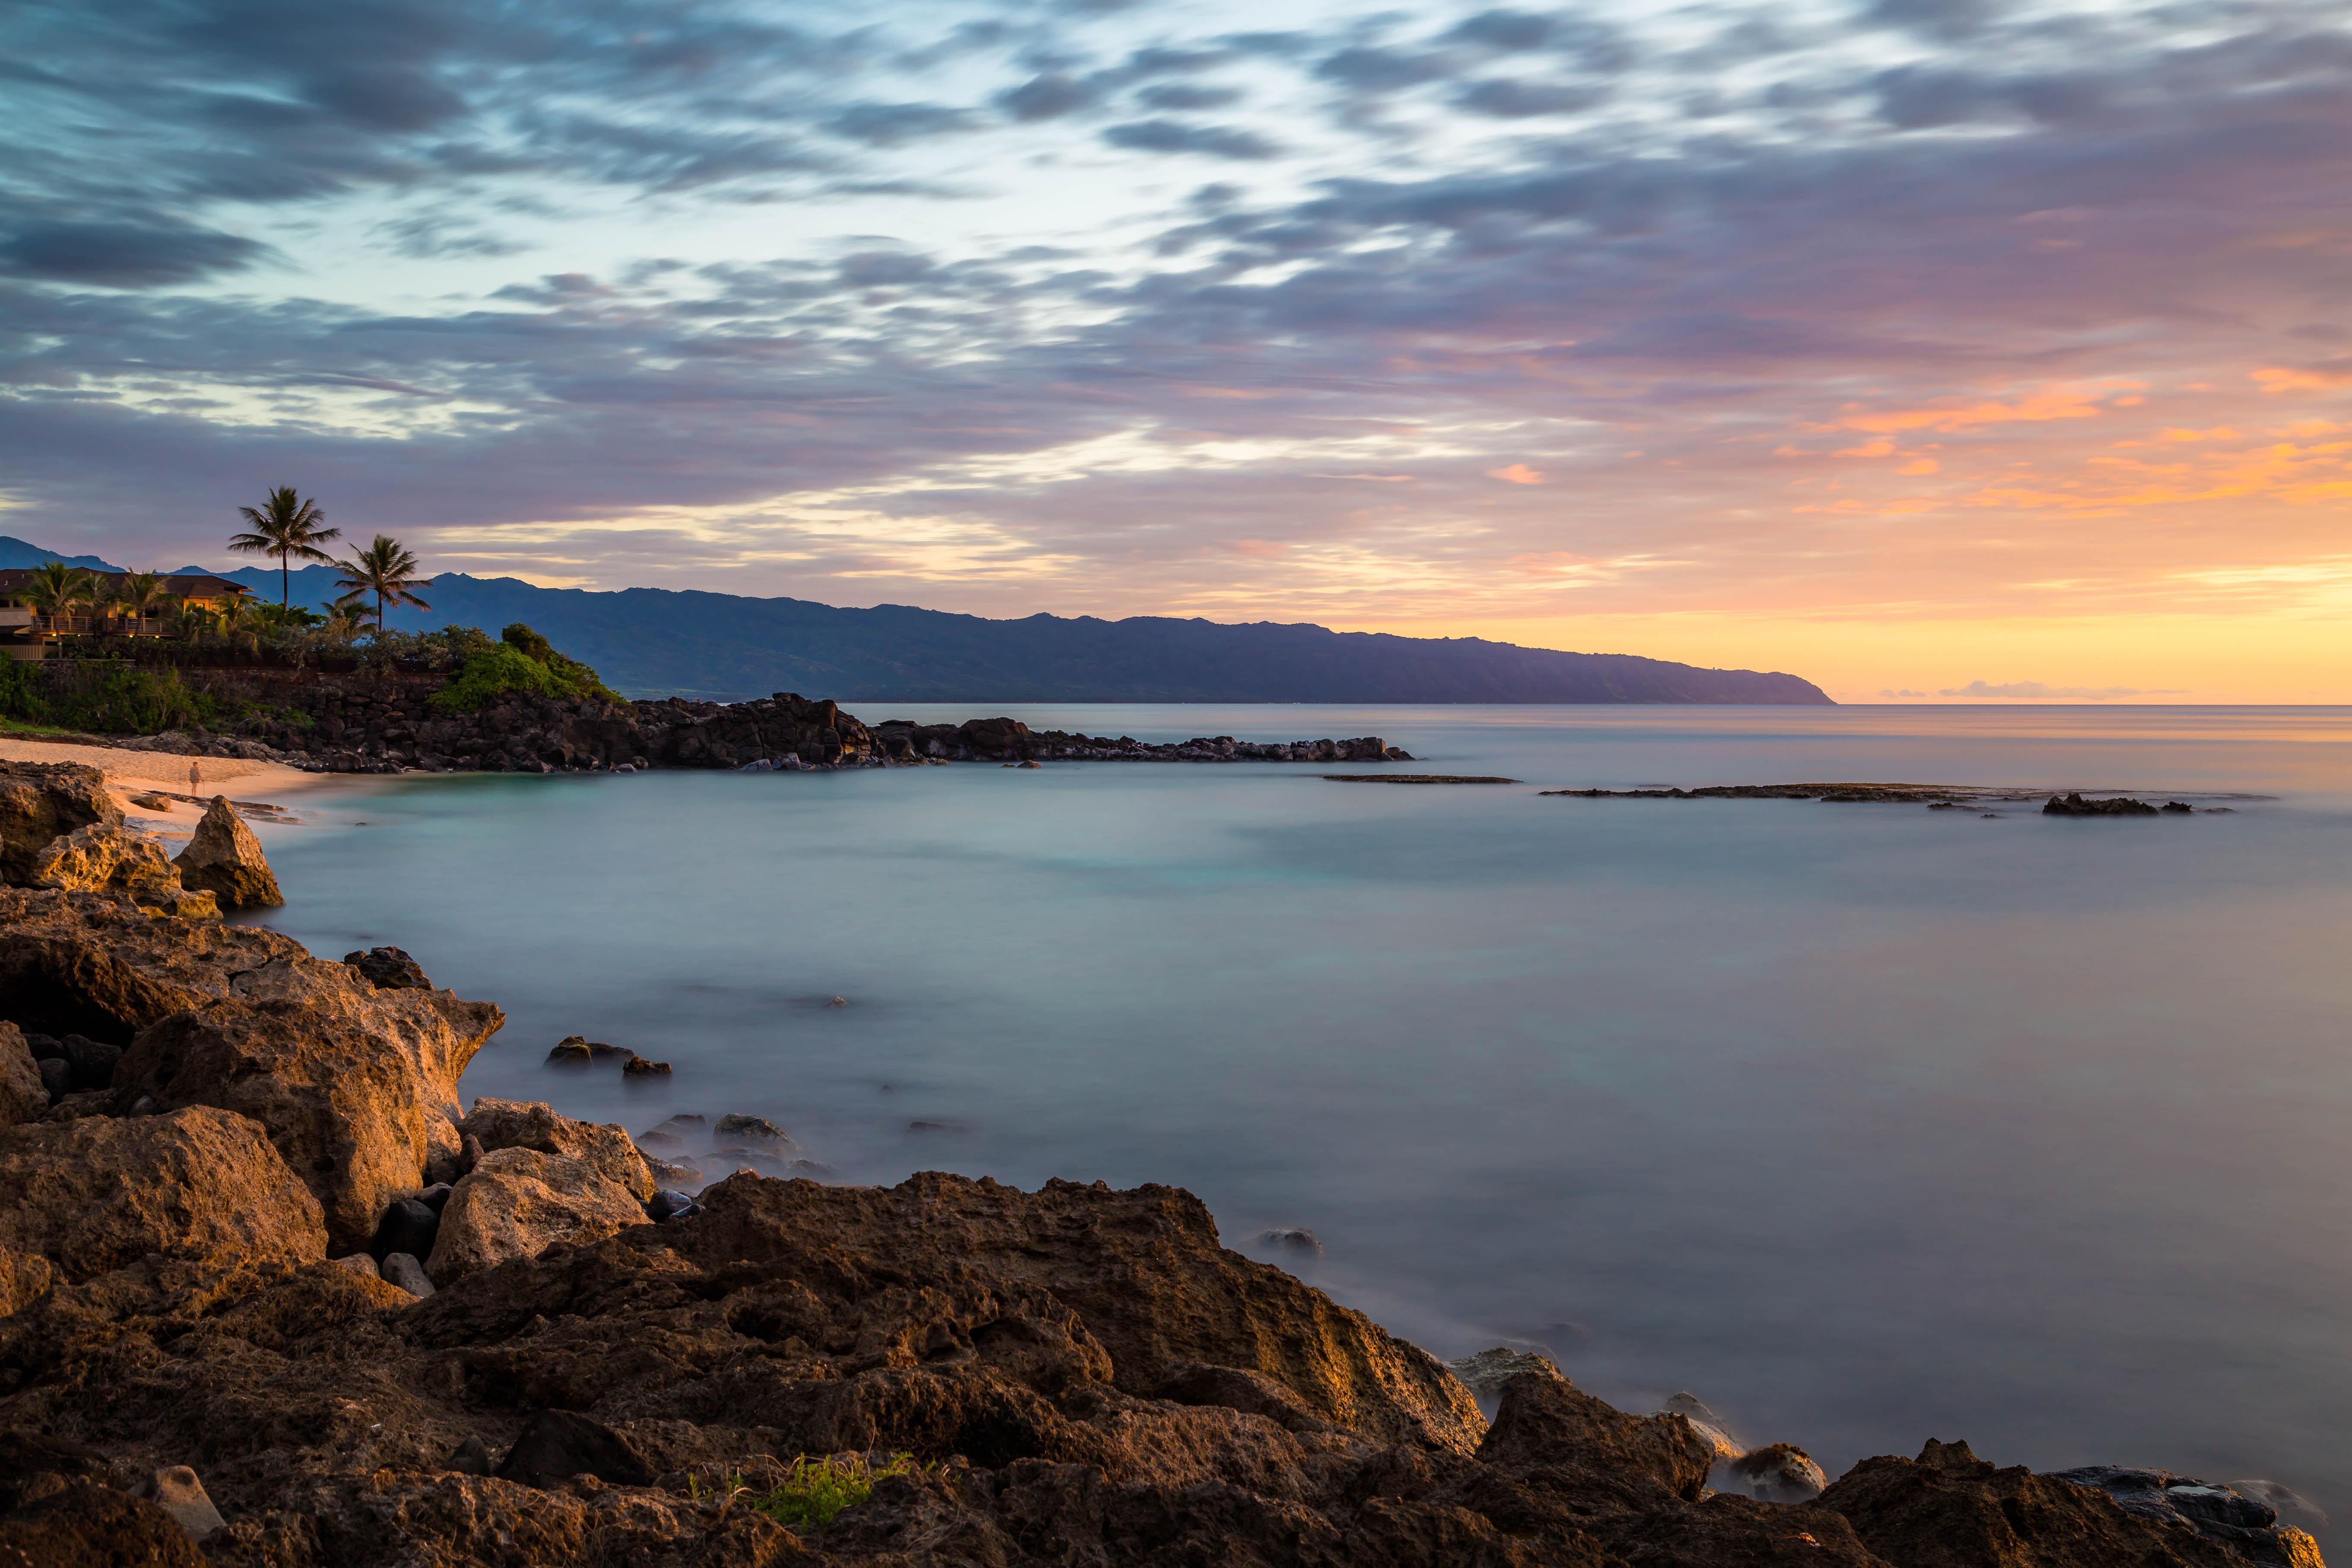 blue ocean in front of rockl